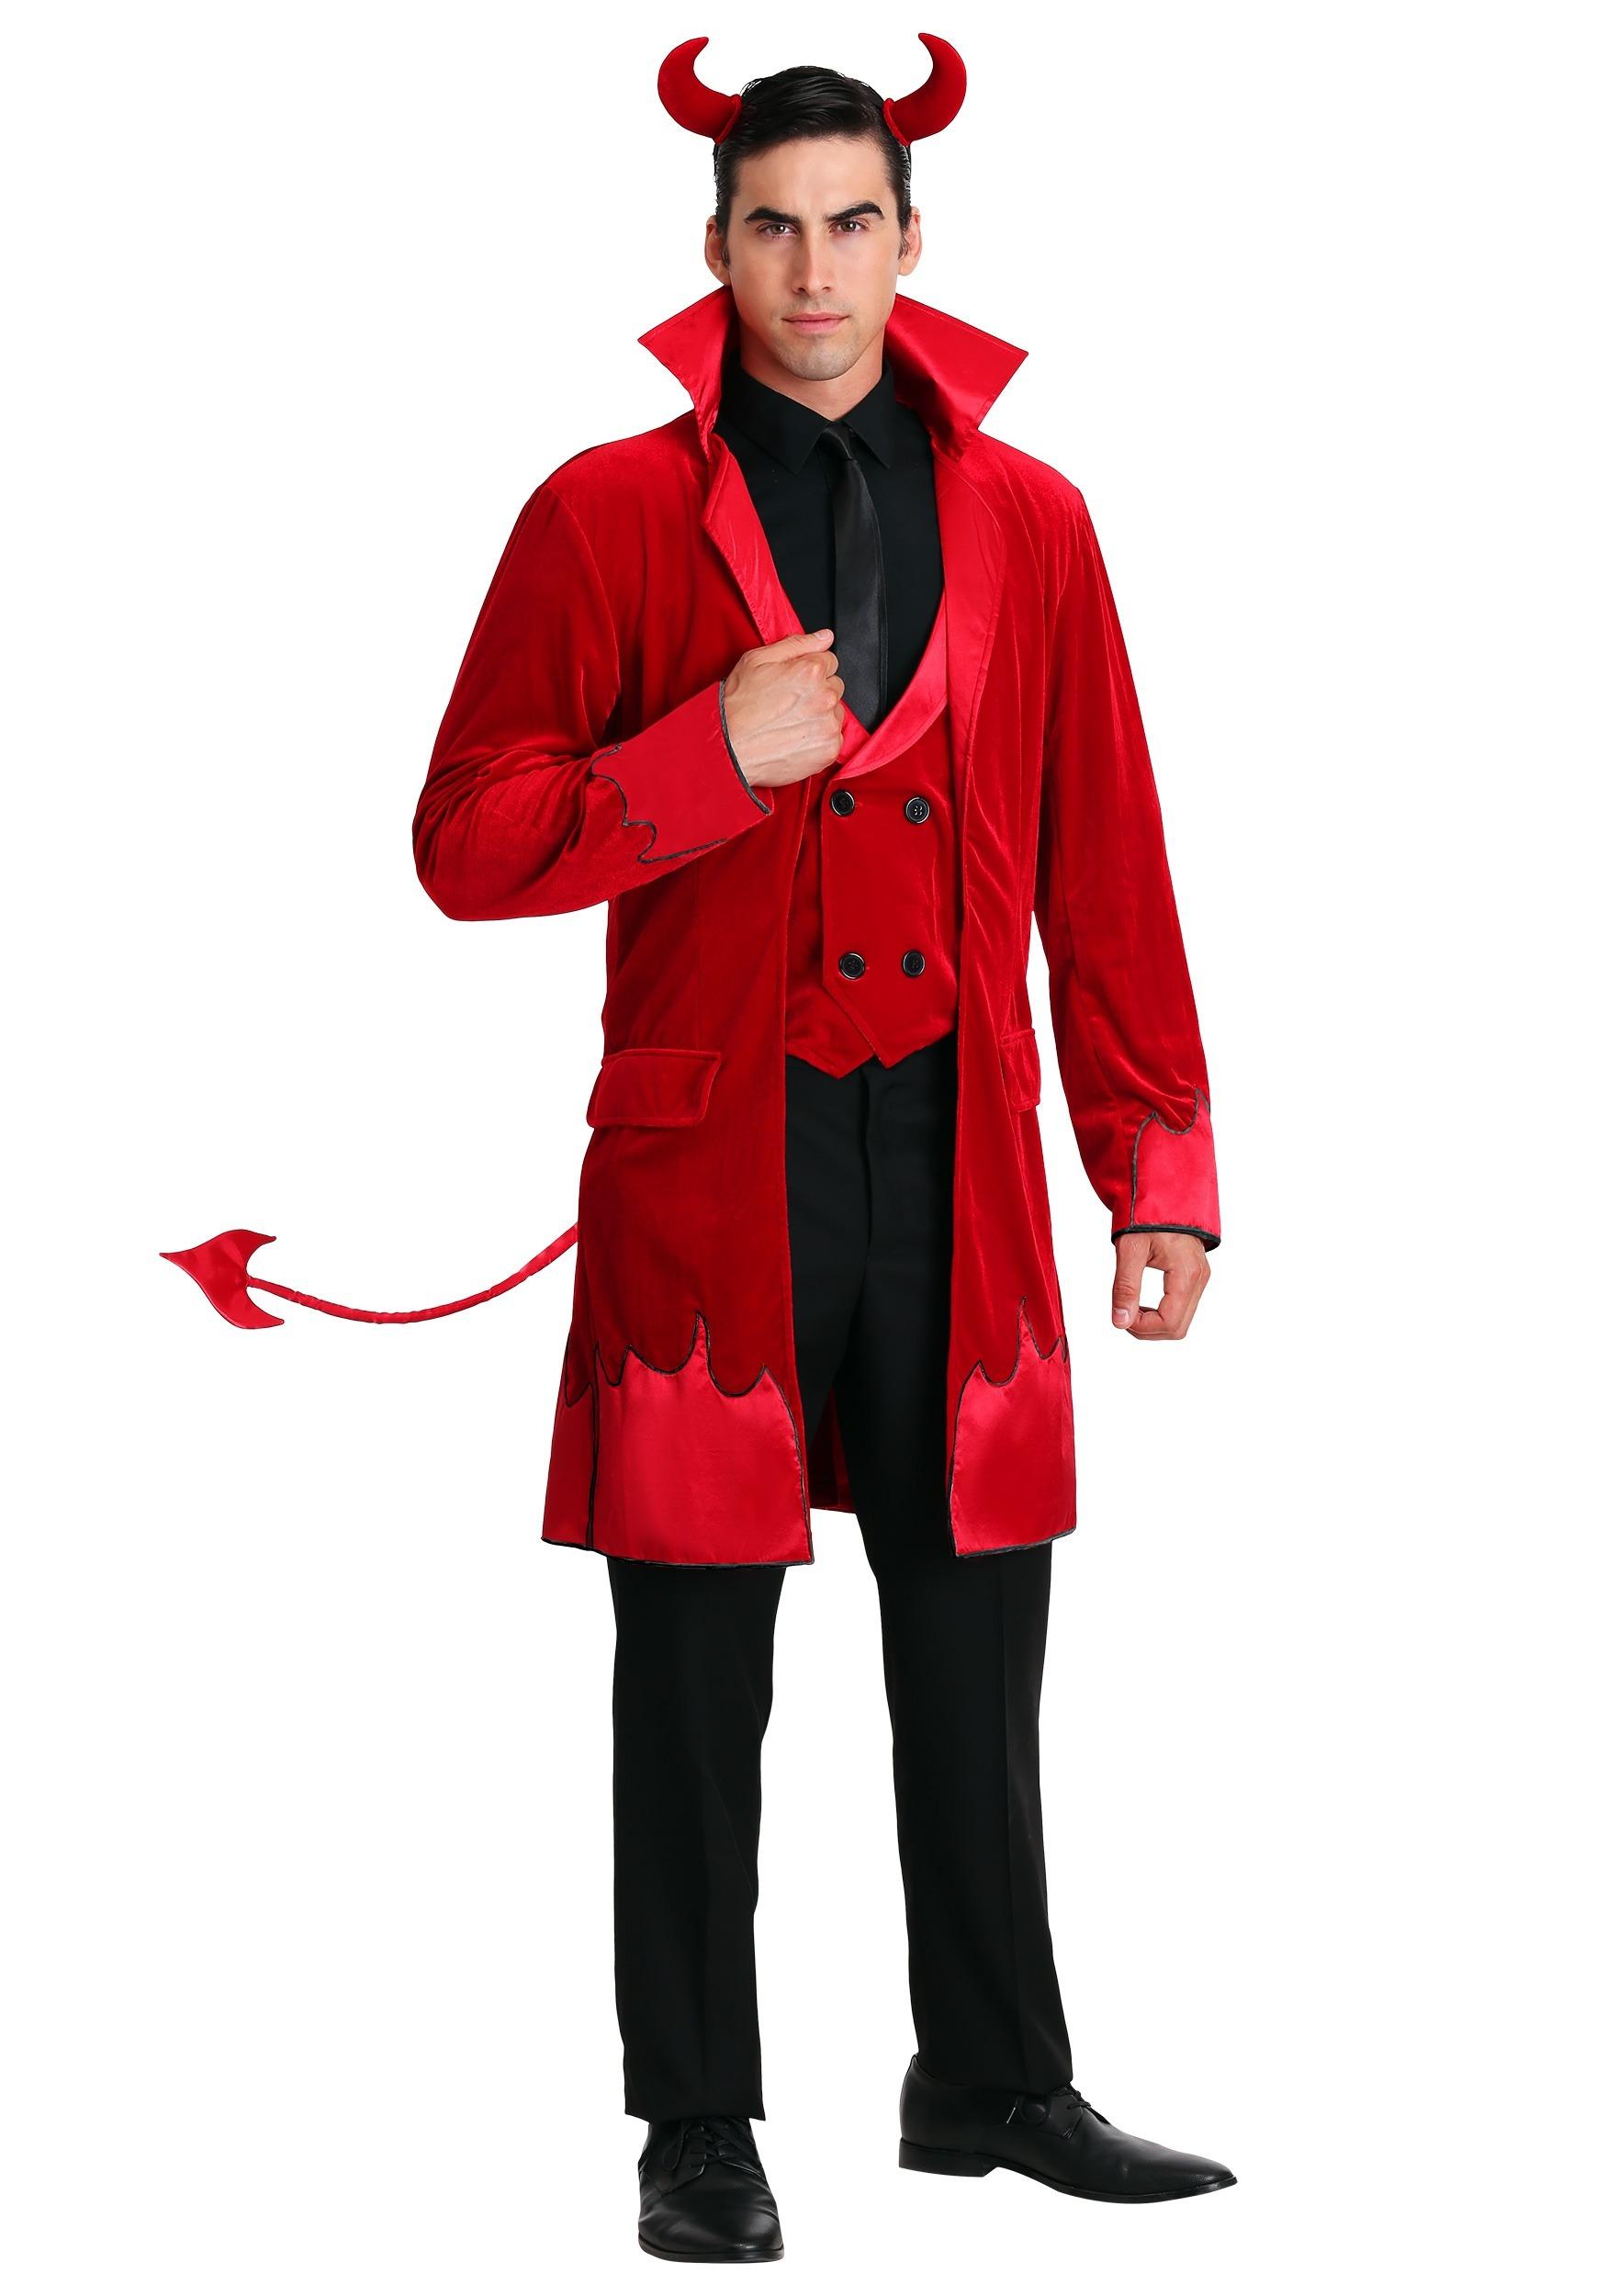 debonair devil men's costume